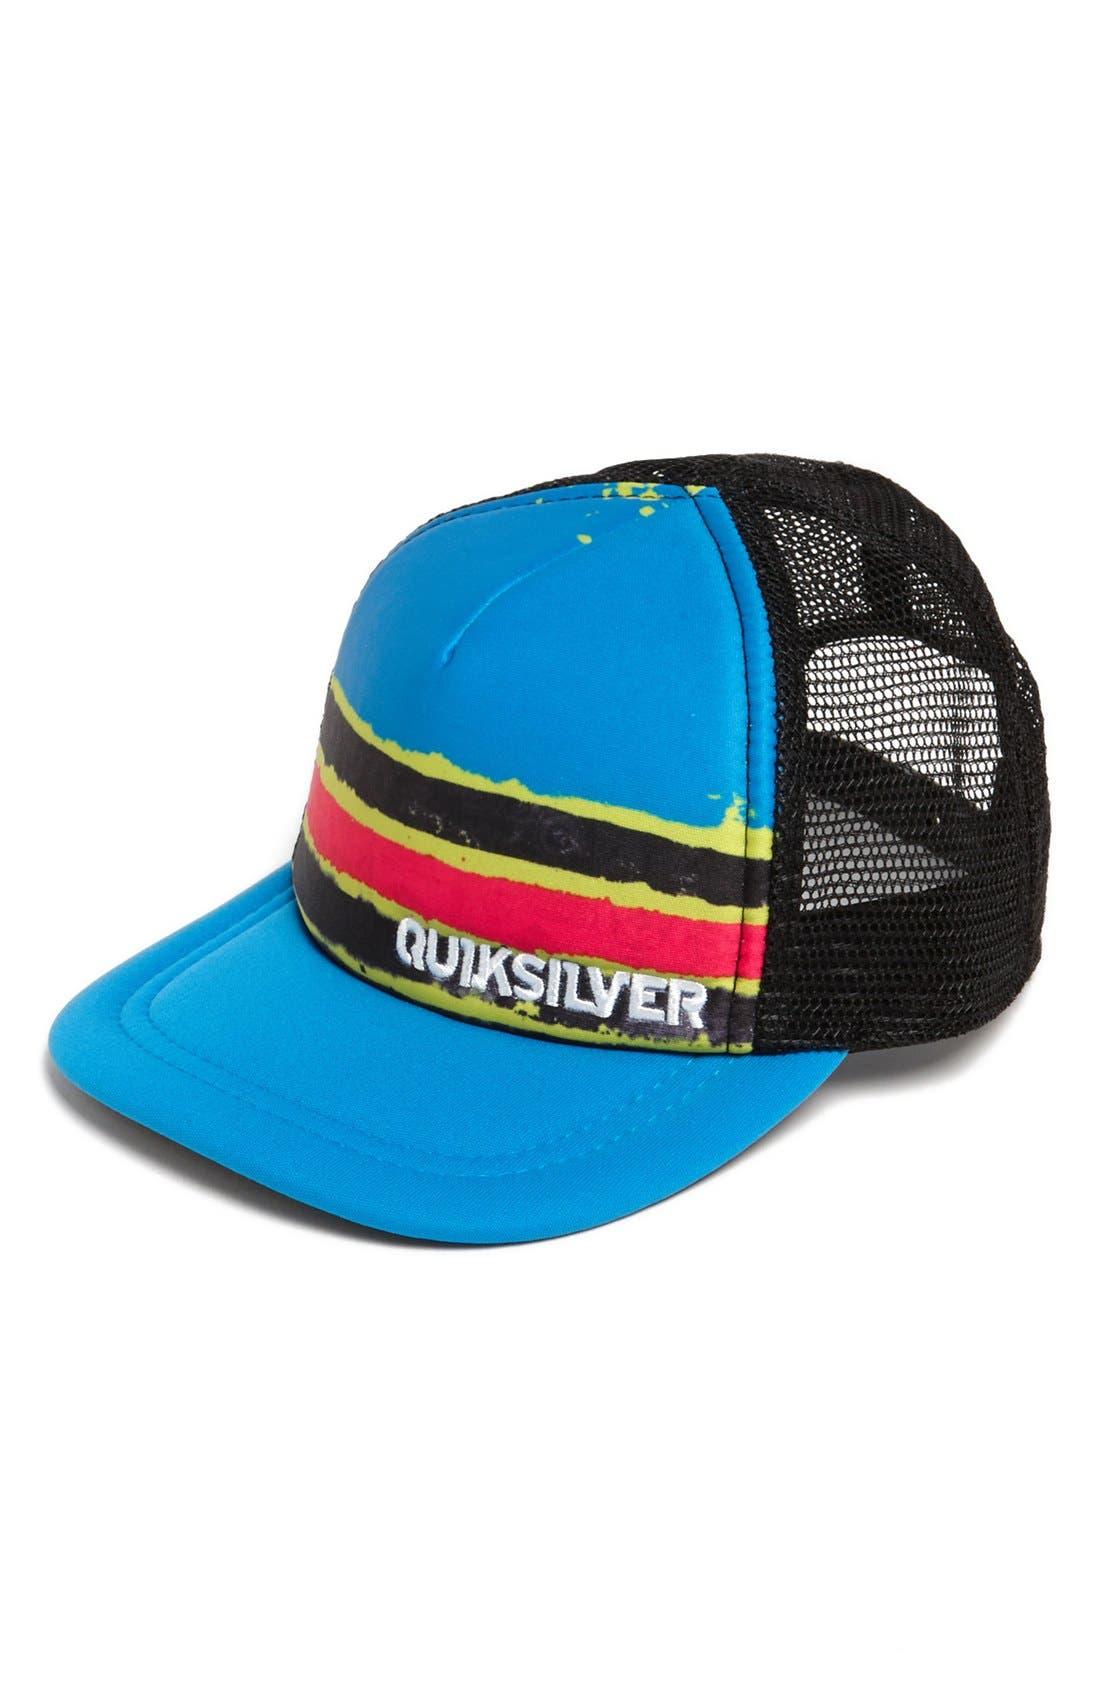 Main Image - Quiksilver 'Boards' Trucker Hat (Toddler Boys)